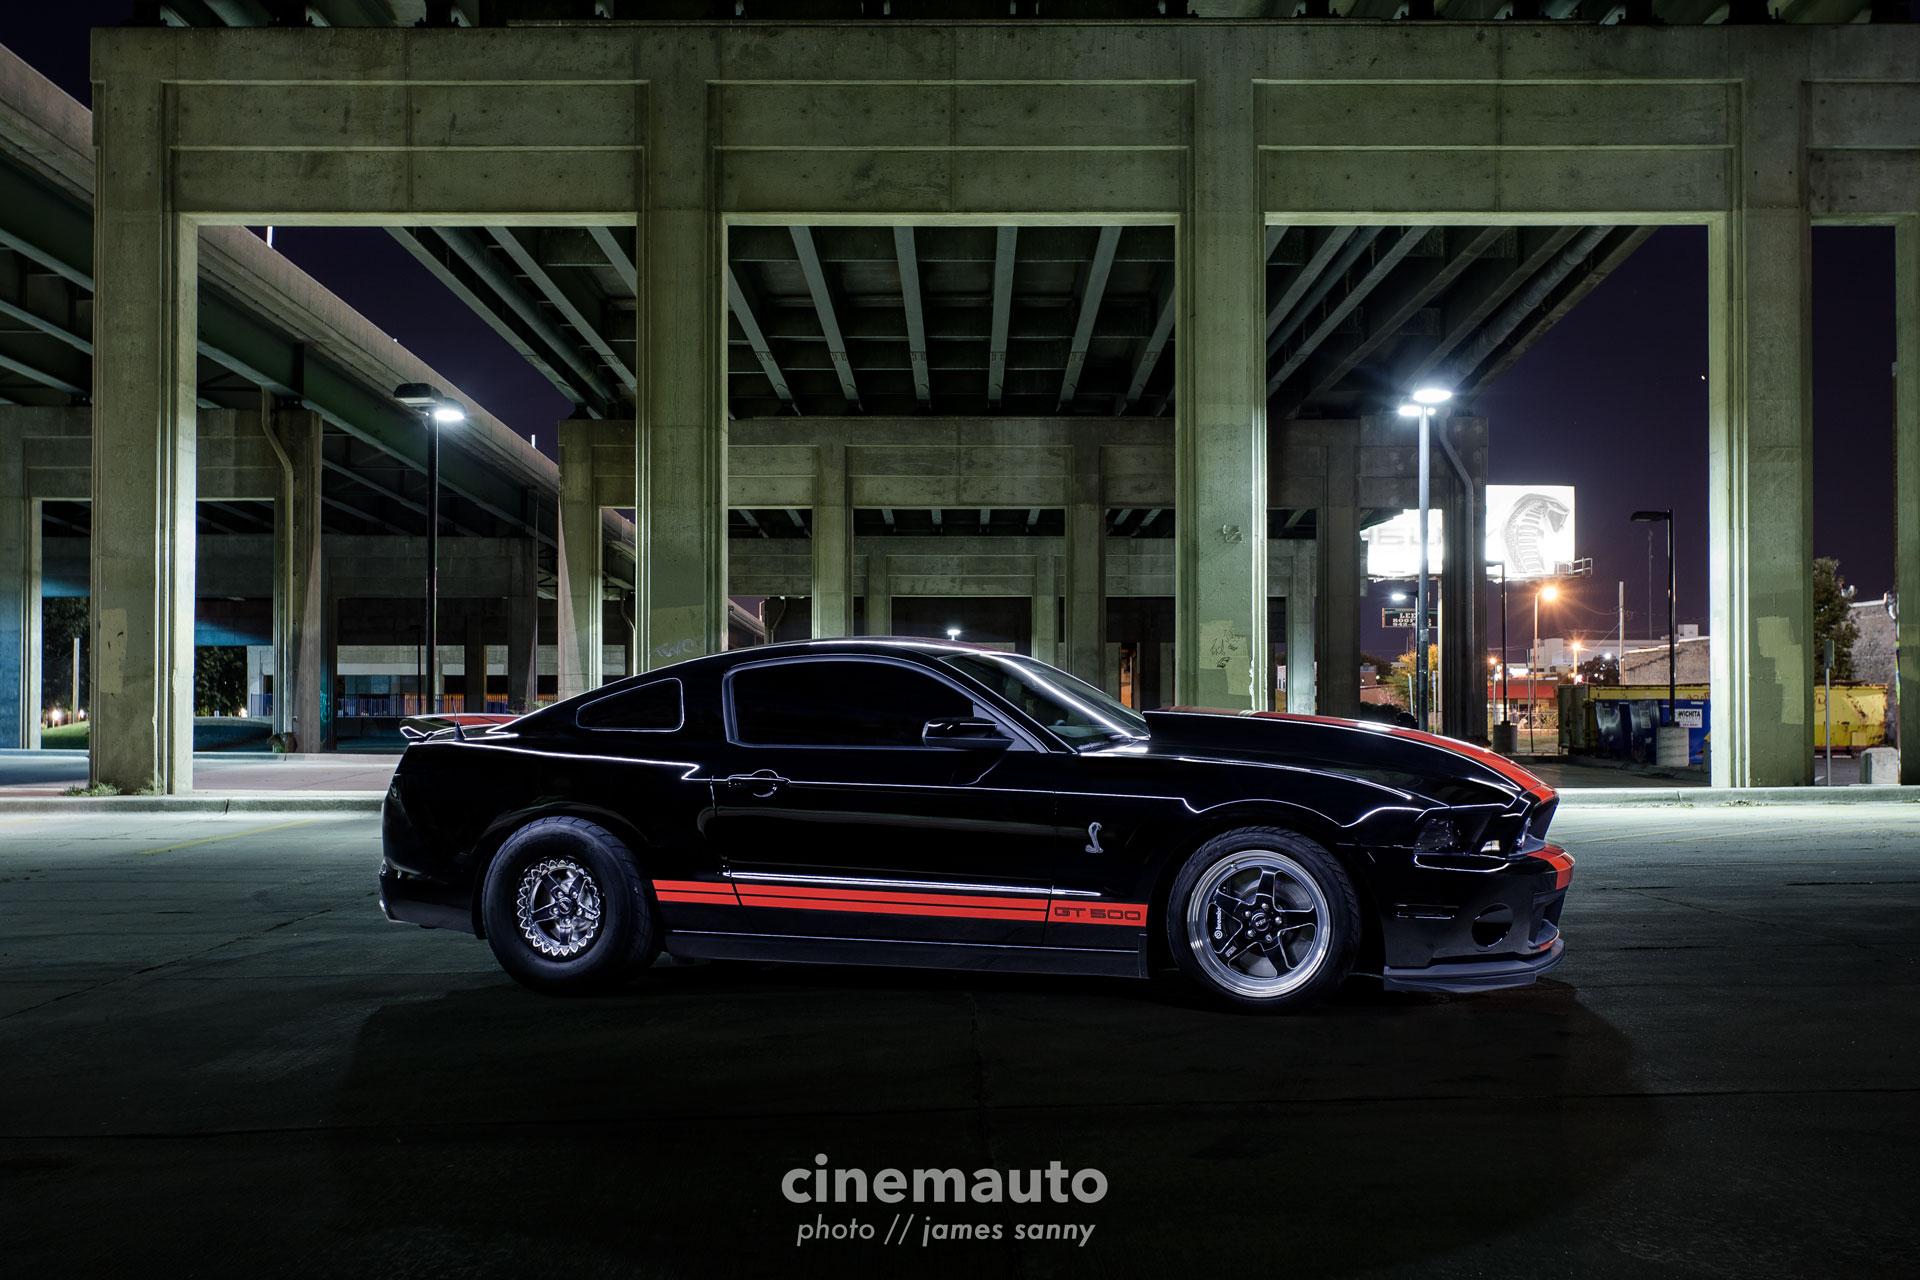 cinemauto-wichita-automotive-photography-cj1a.jpg